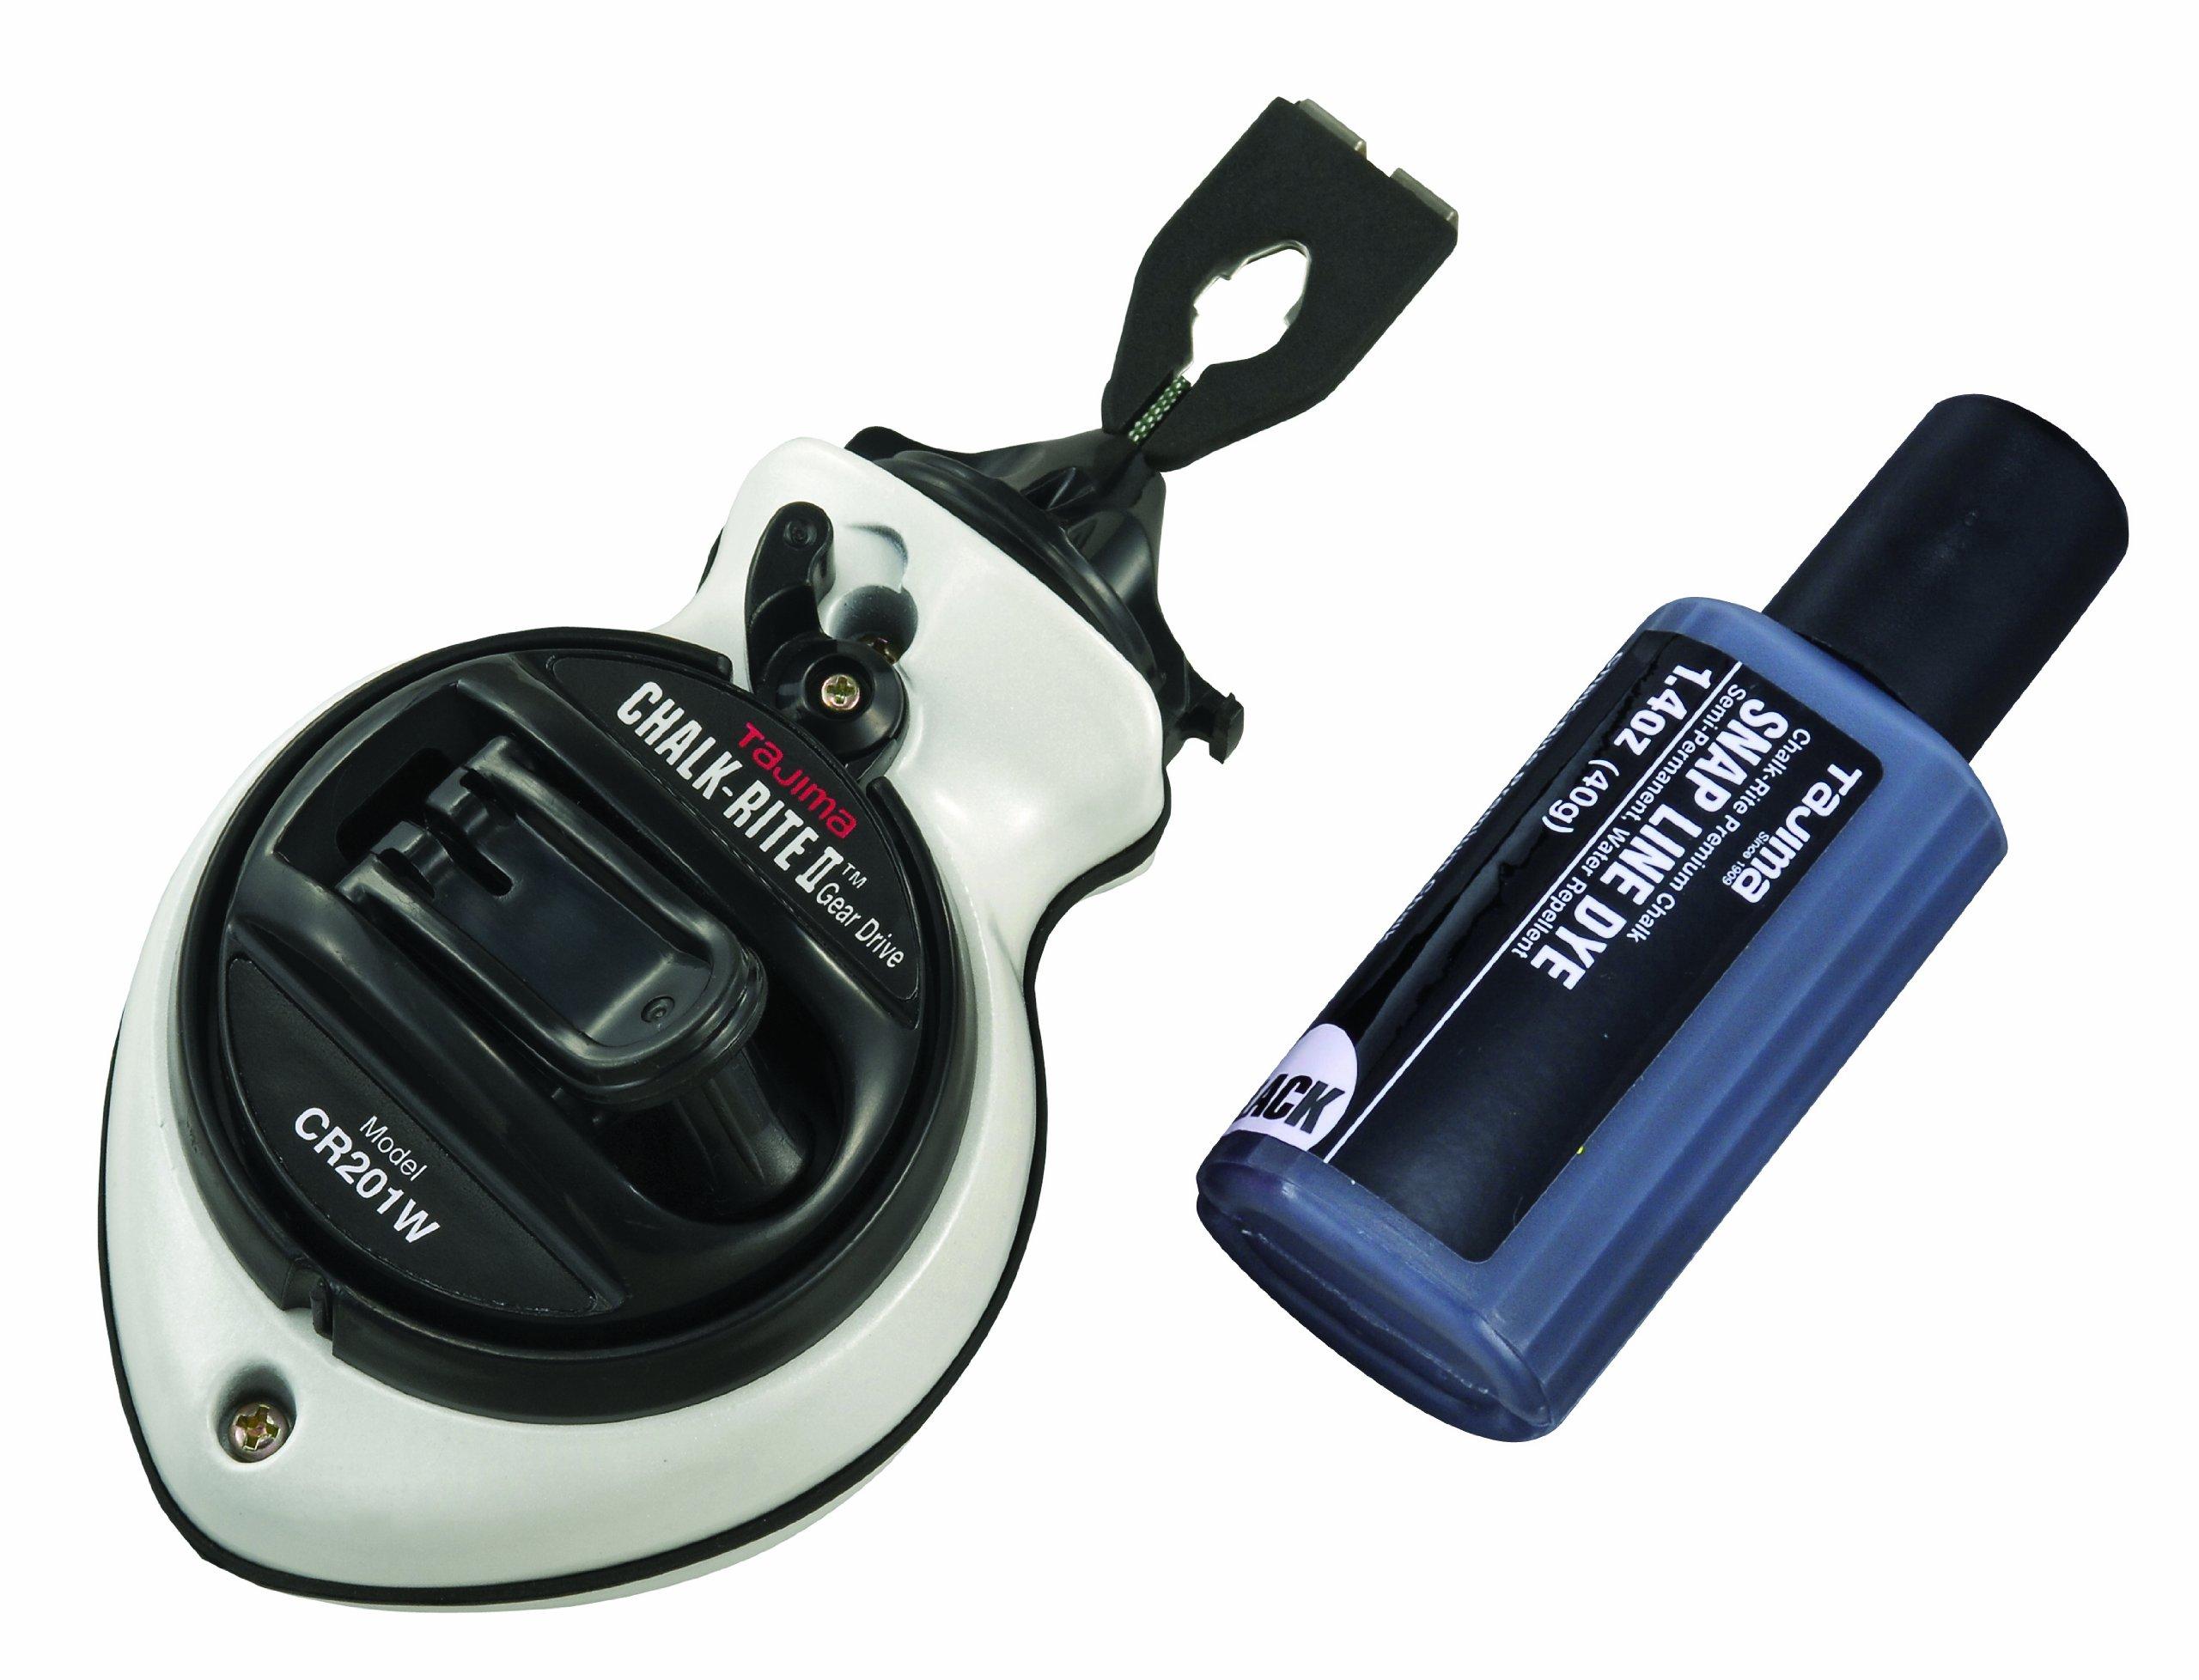 TAJIMA Chalk Box - Chalk-Rite II Snap-Line with Extra Bold 1mm Chalk Line & Five Gear Quick Retrieval - CR201W-P